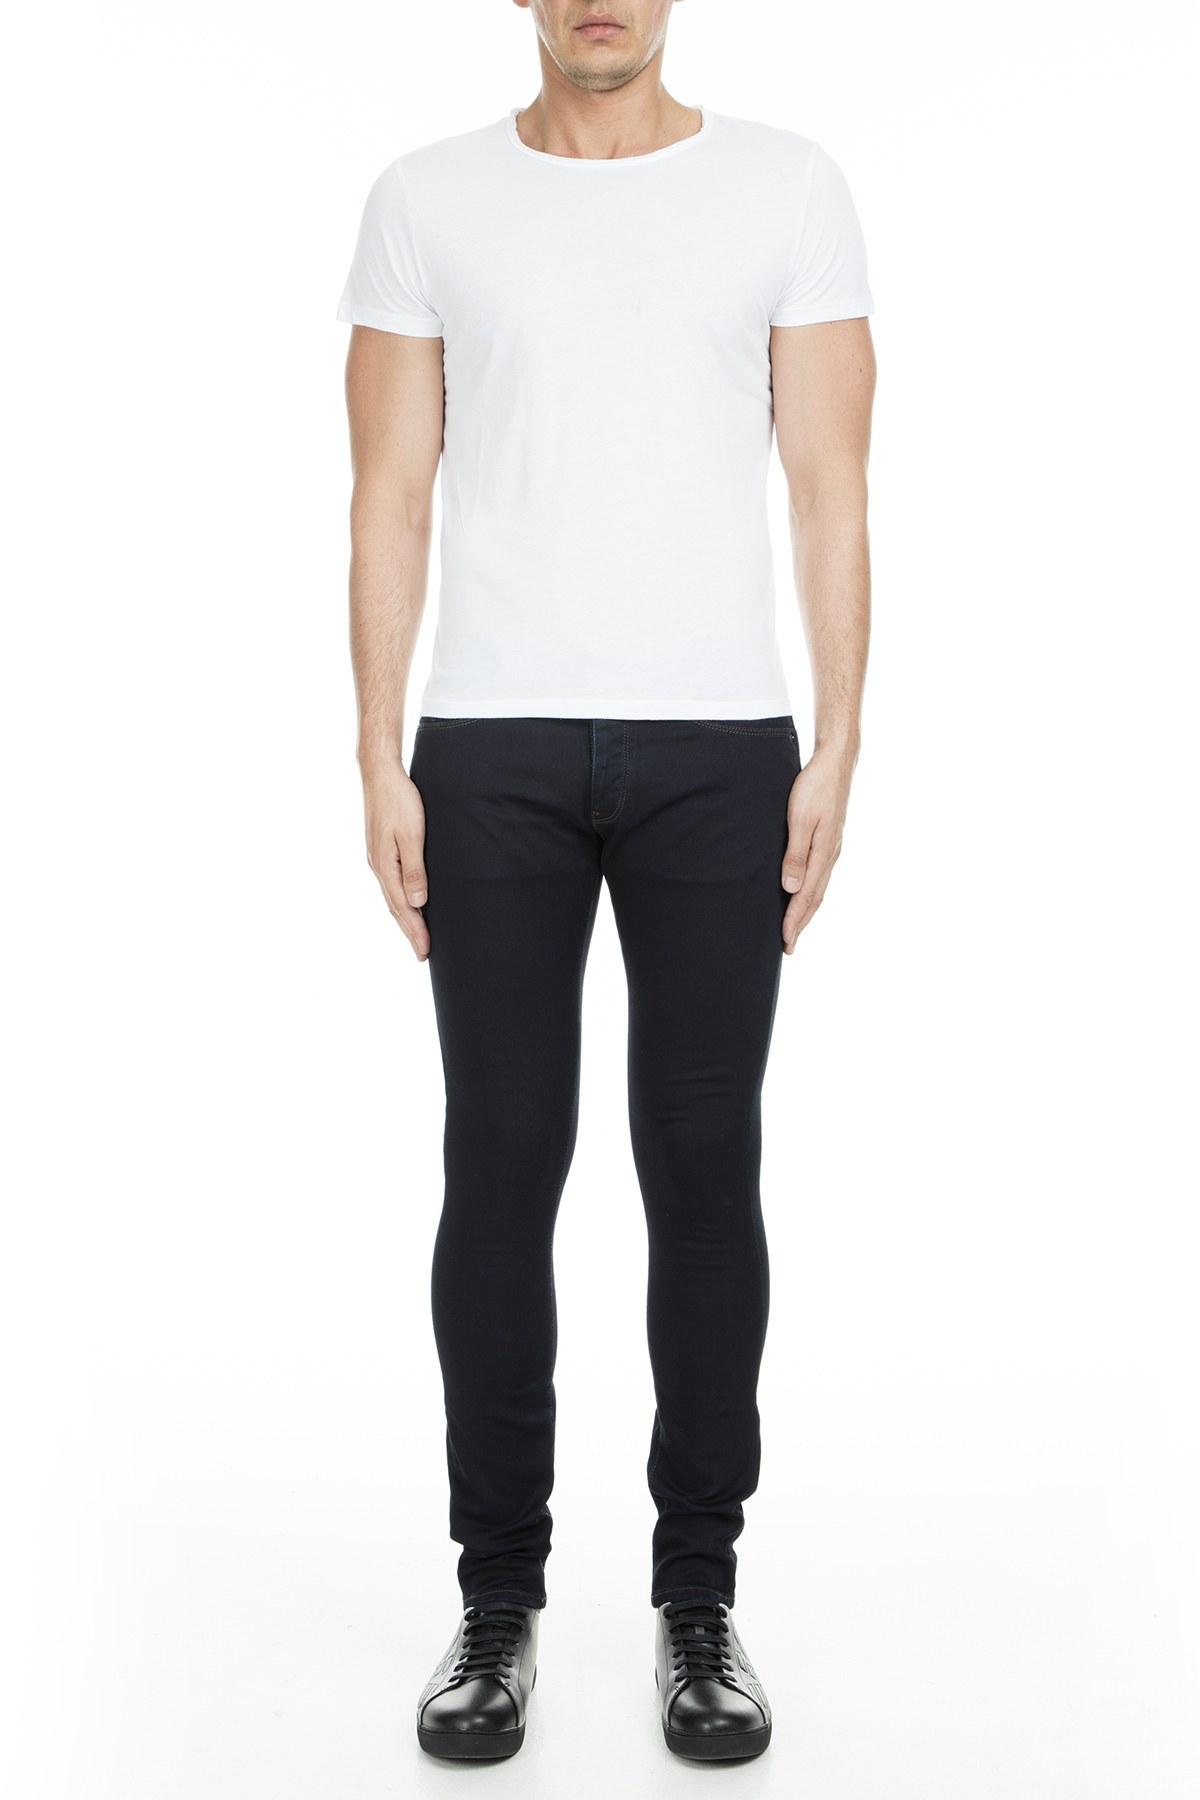 Emporio Armani J35 Jeans Erkek Kot Pantolon 3G1J35 1D0PZ 0941 MAVİ